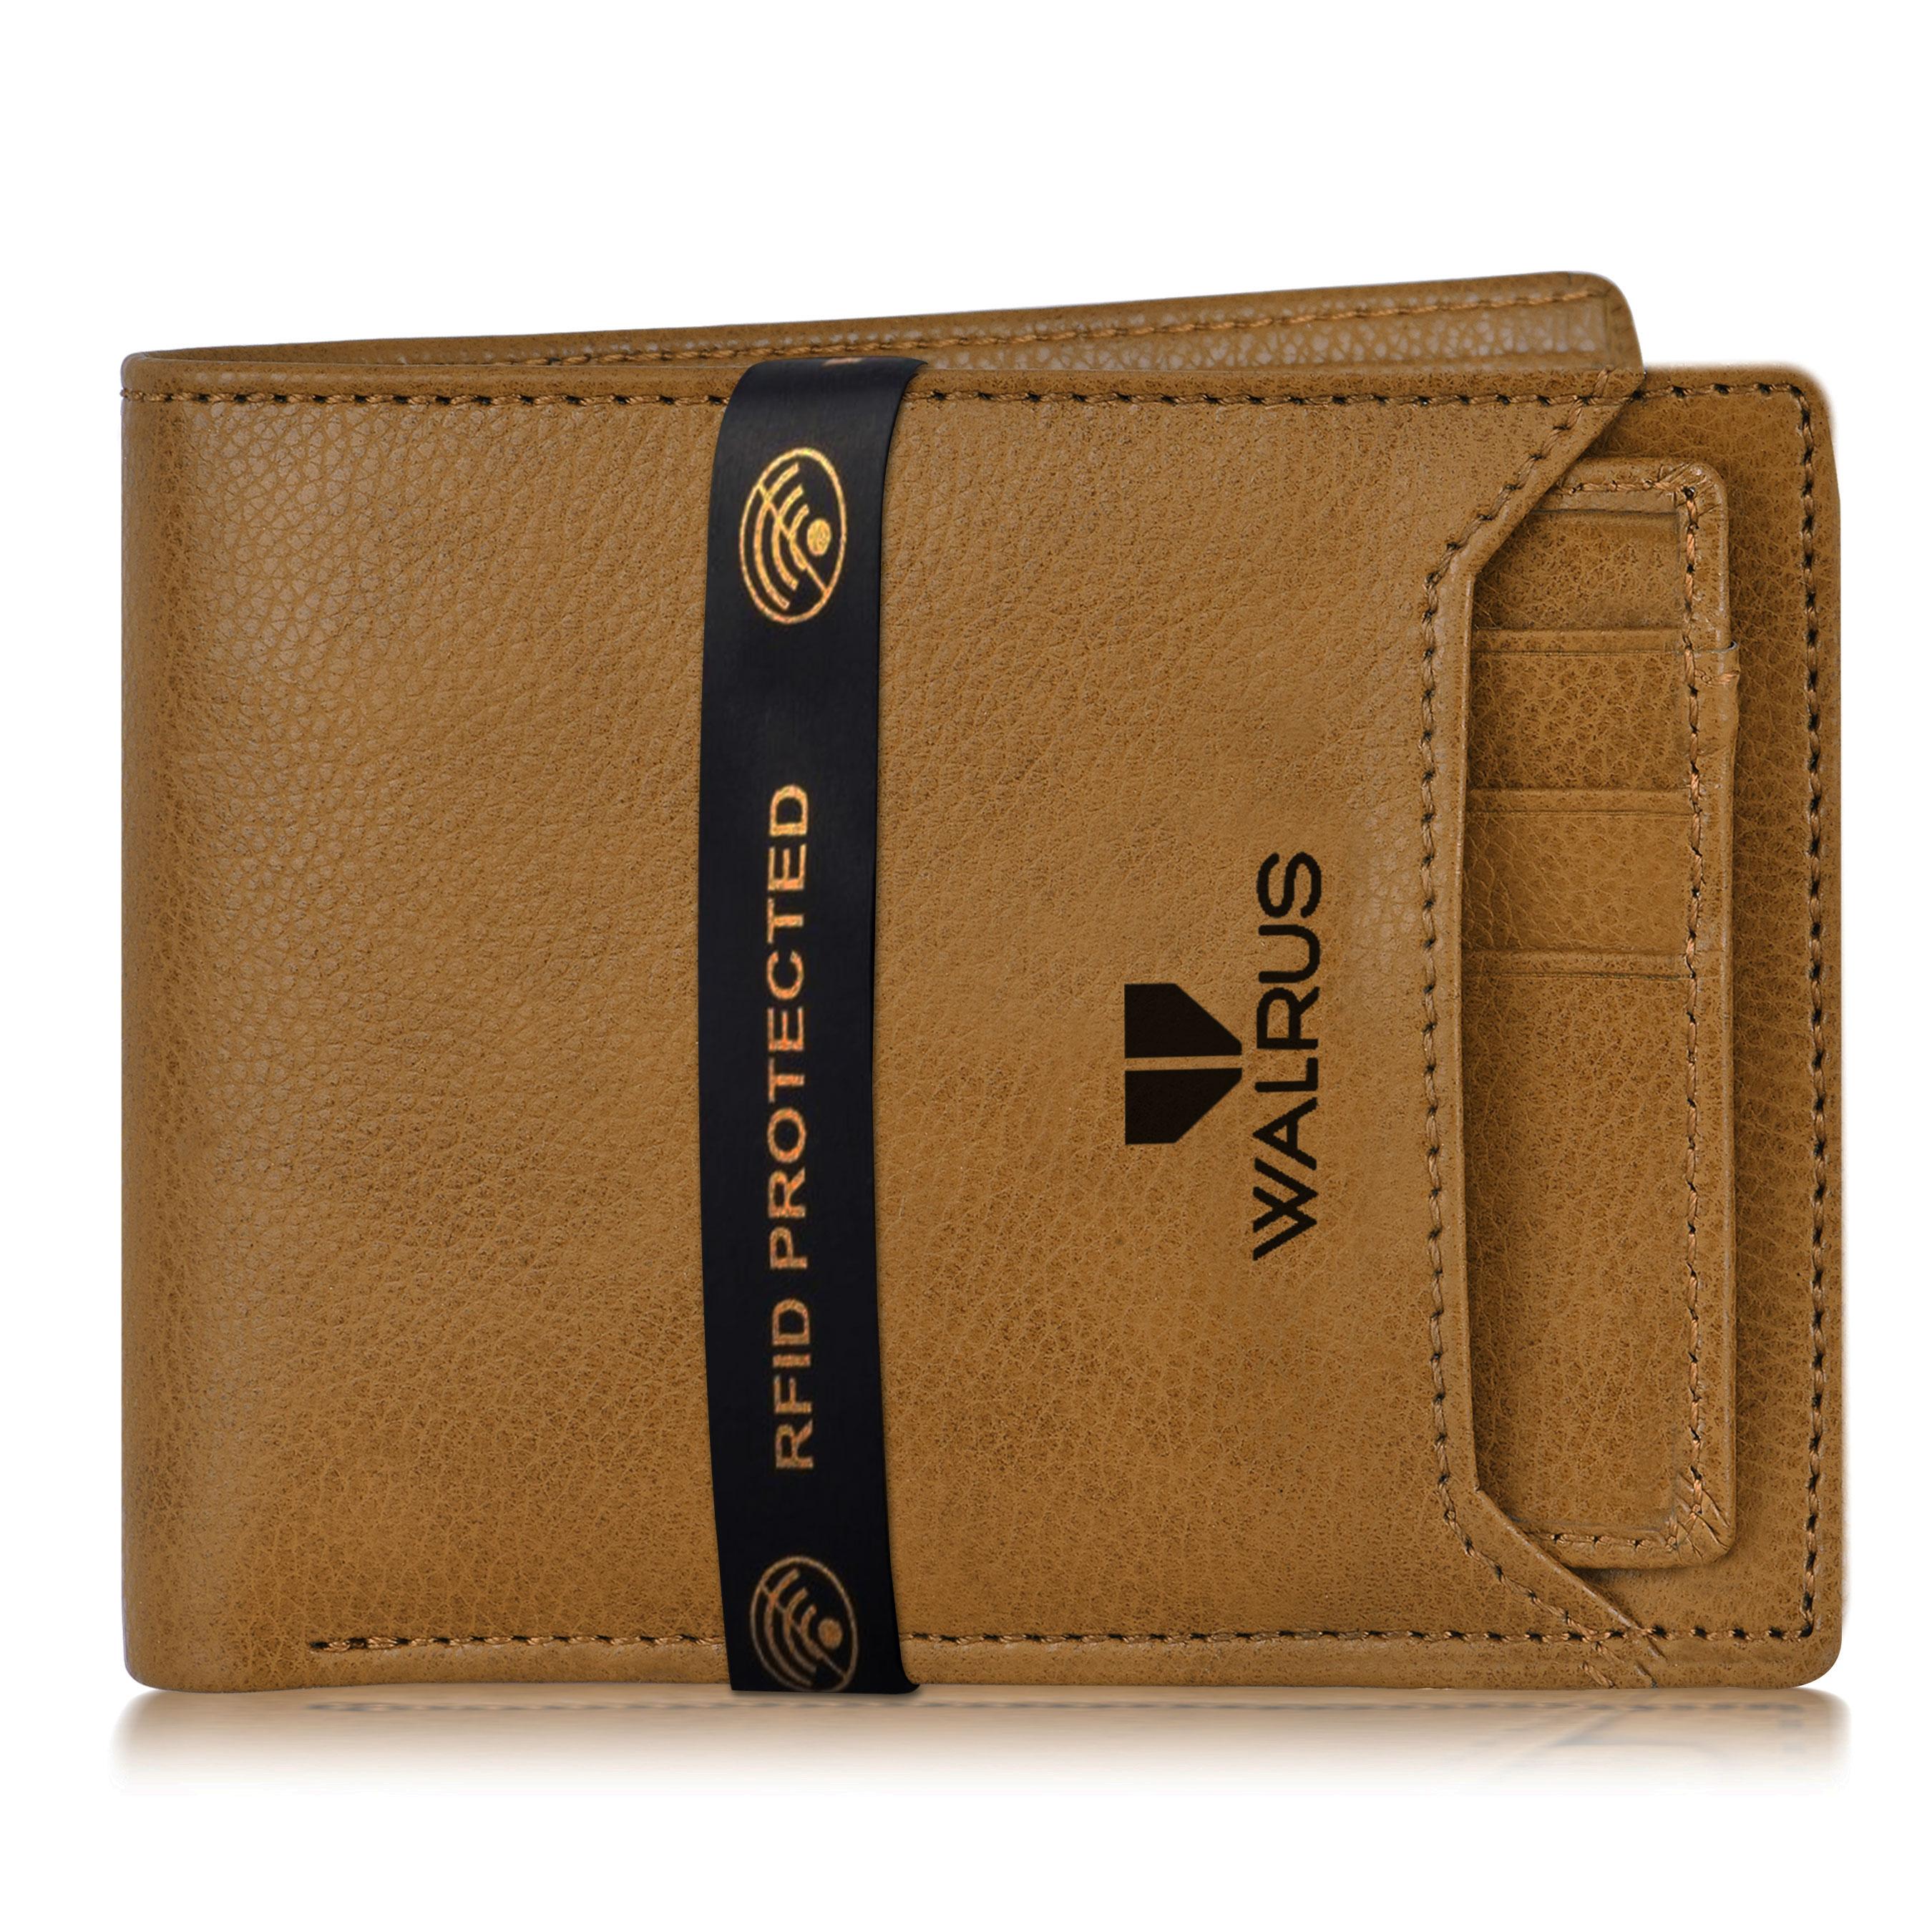 Walrus   Walrus Duke-VI Beige Vegan Leather Men Wallet With RFID Protection.